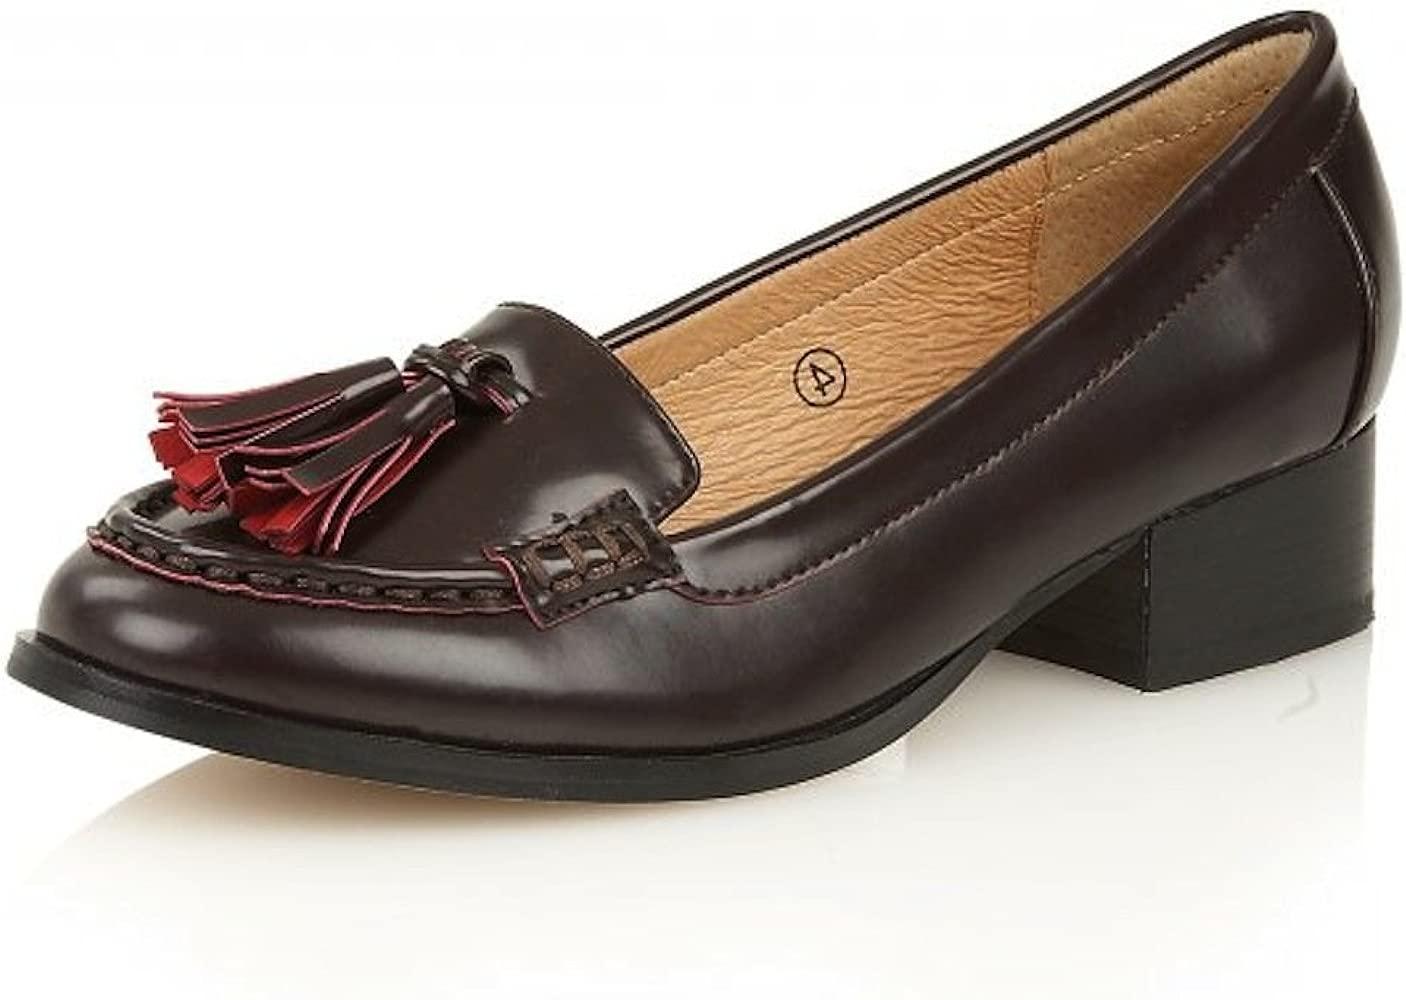 brand new fast delivery 50% price Ravel Brantford - Womens Burgundy Chic Tassel Low Heel Slip On ...